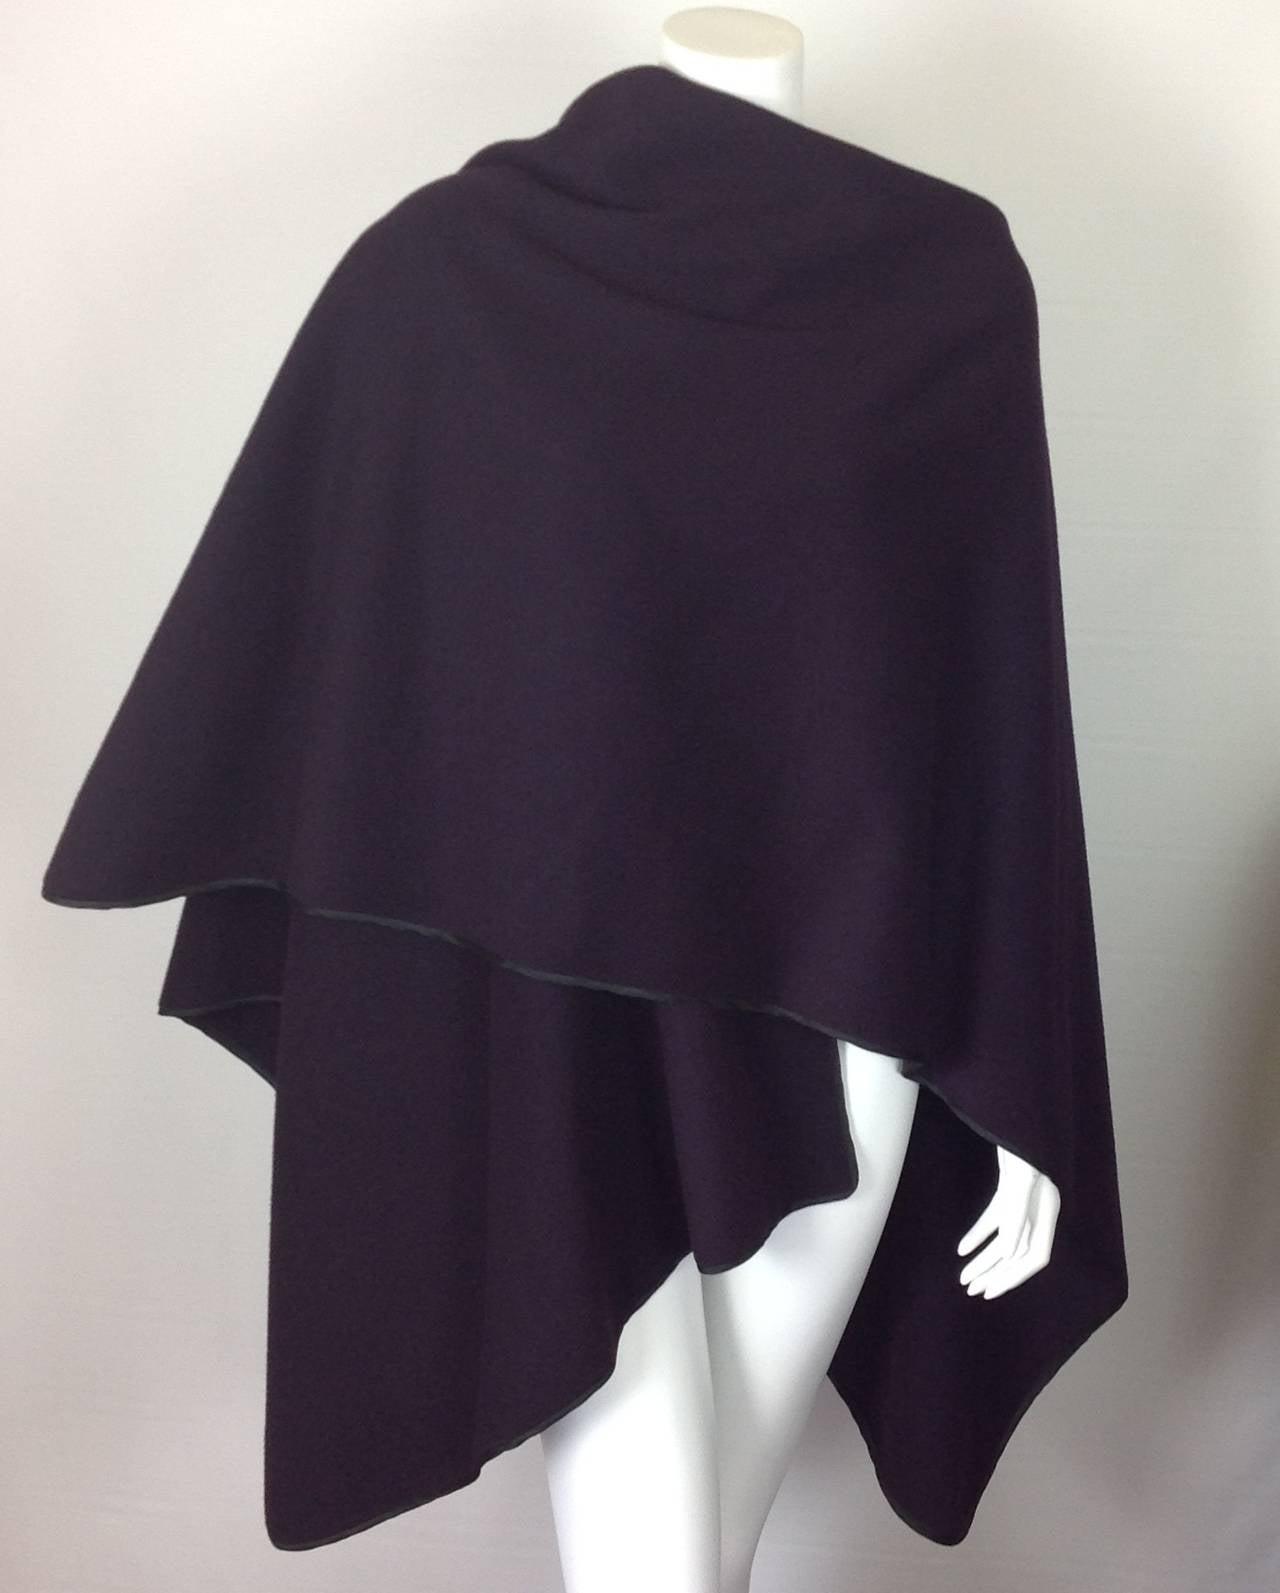 Capas Sesena violet poncho 4